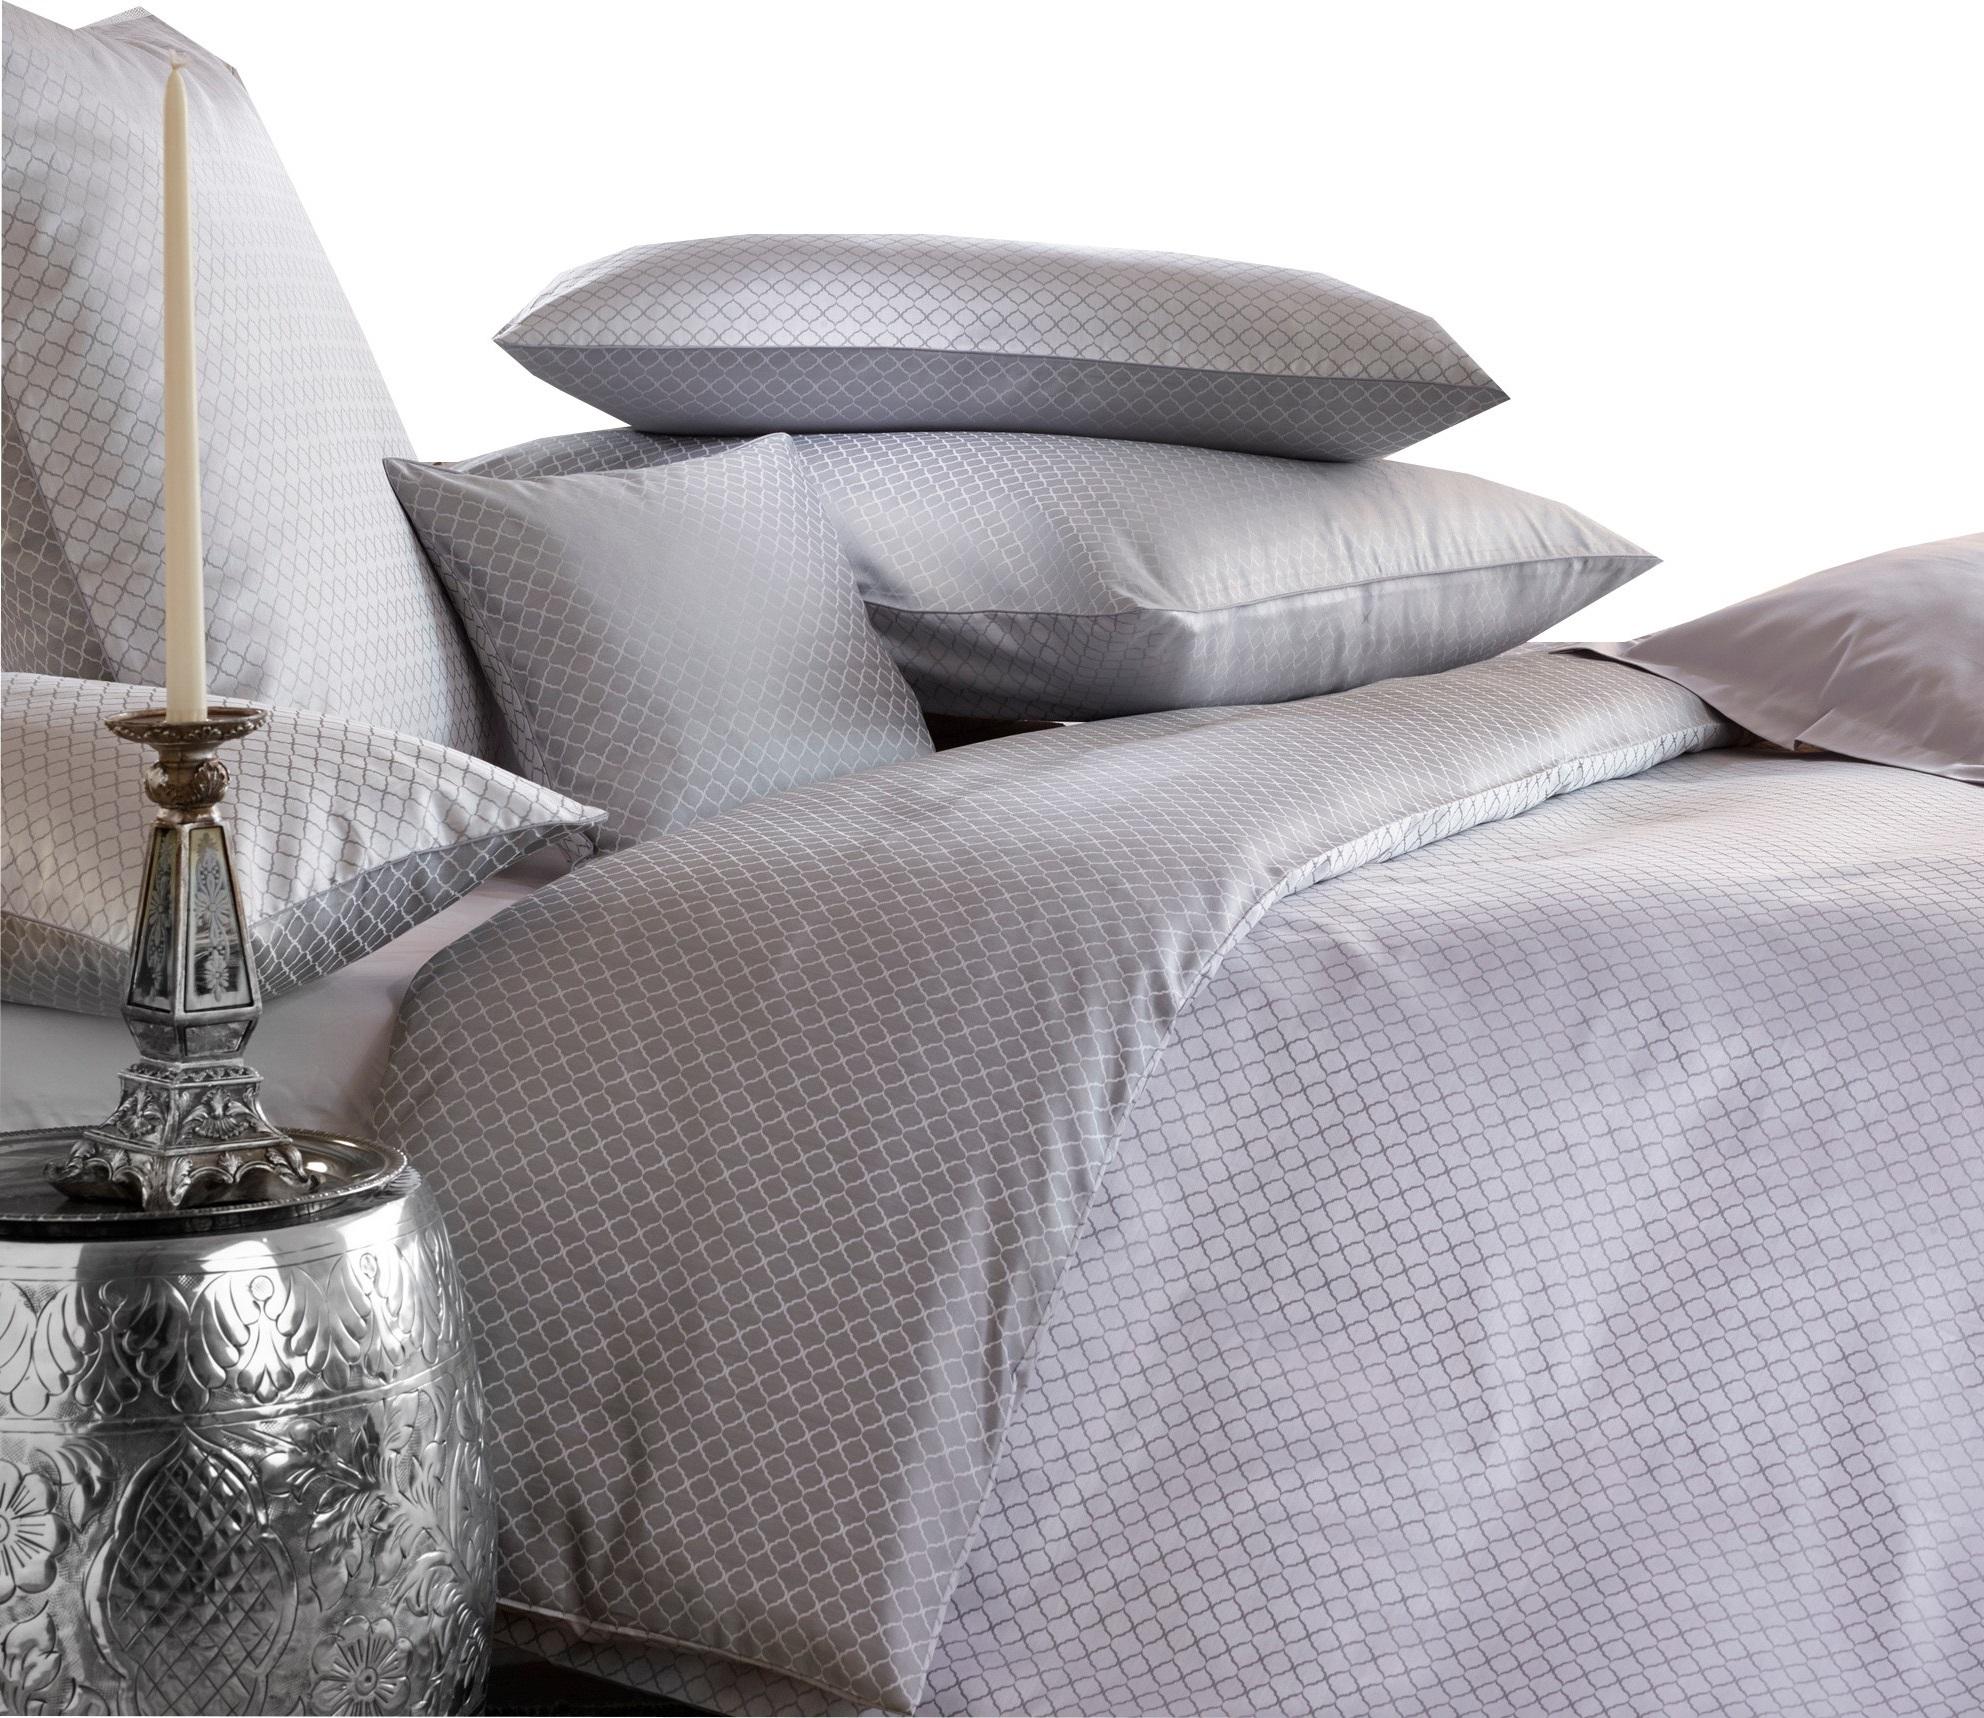 curt bauer mako brokat damast bettw sche alisar gr e 140x200 70x90 cm farbe 0138 pfeffer. Black Bedroom Furniture Sets. Home Design Ideas